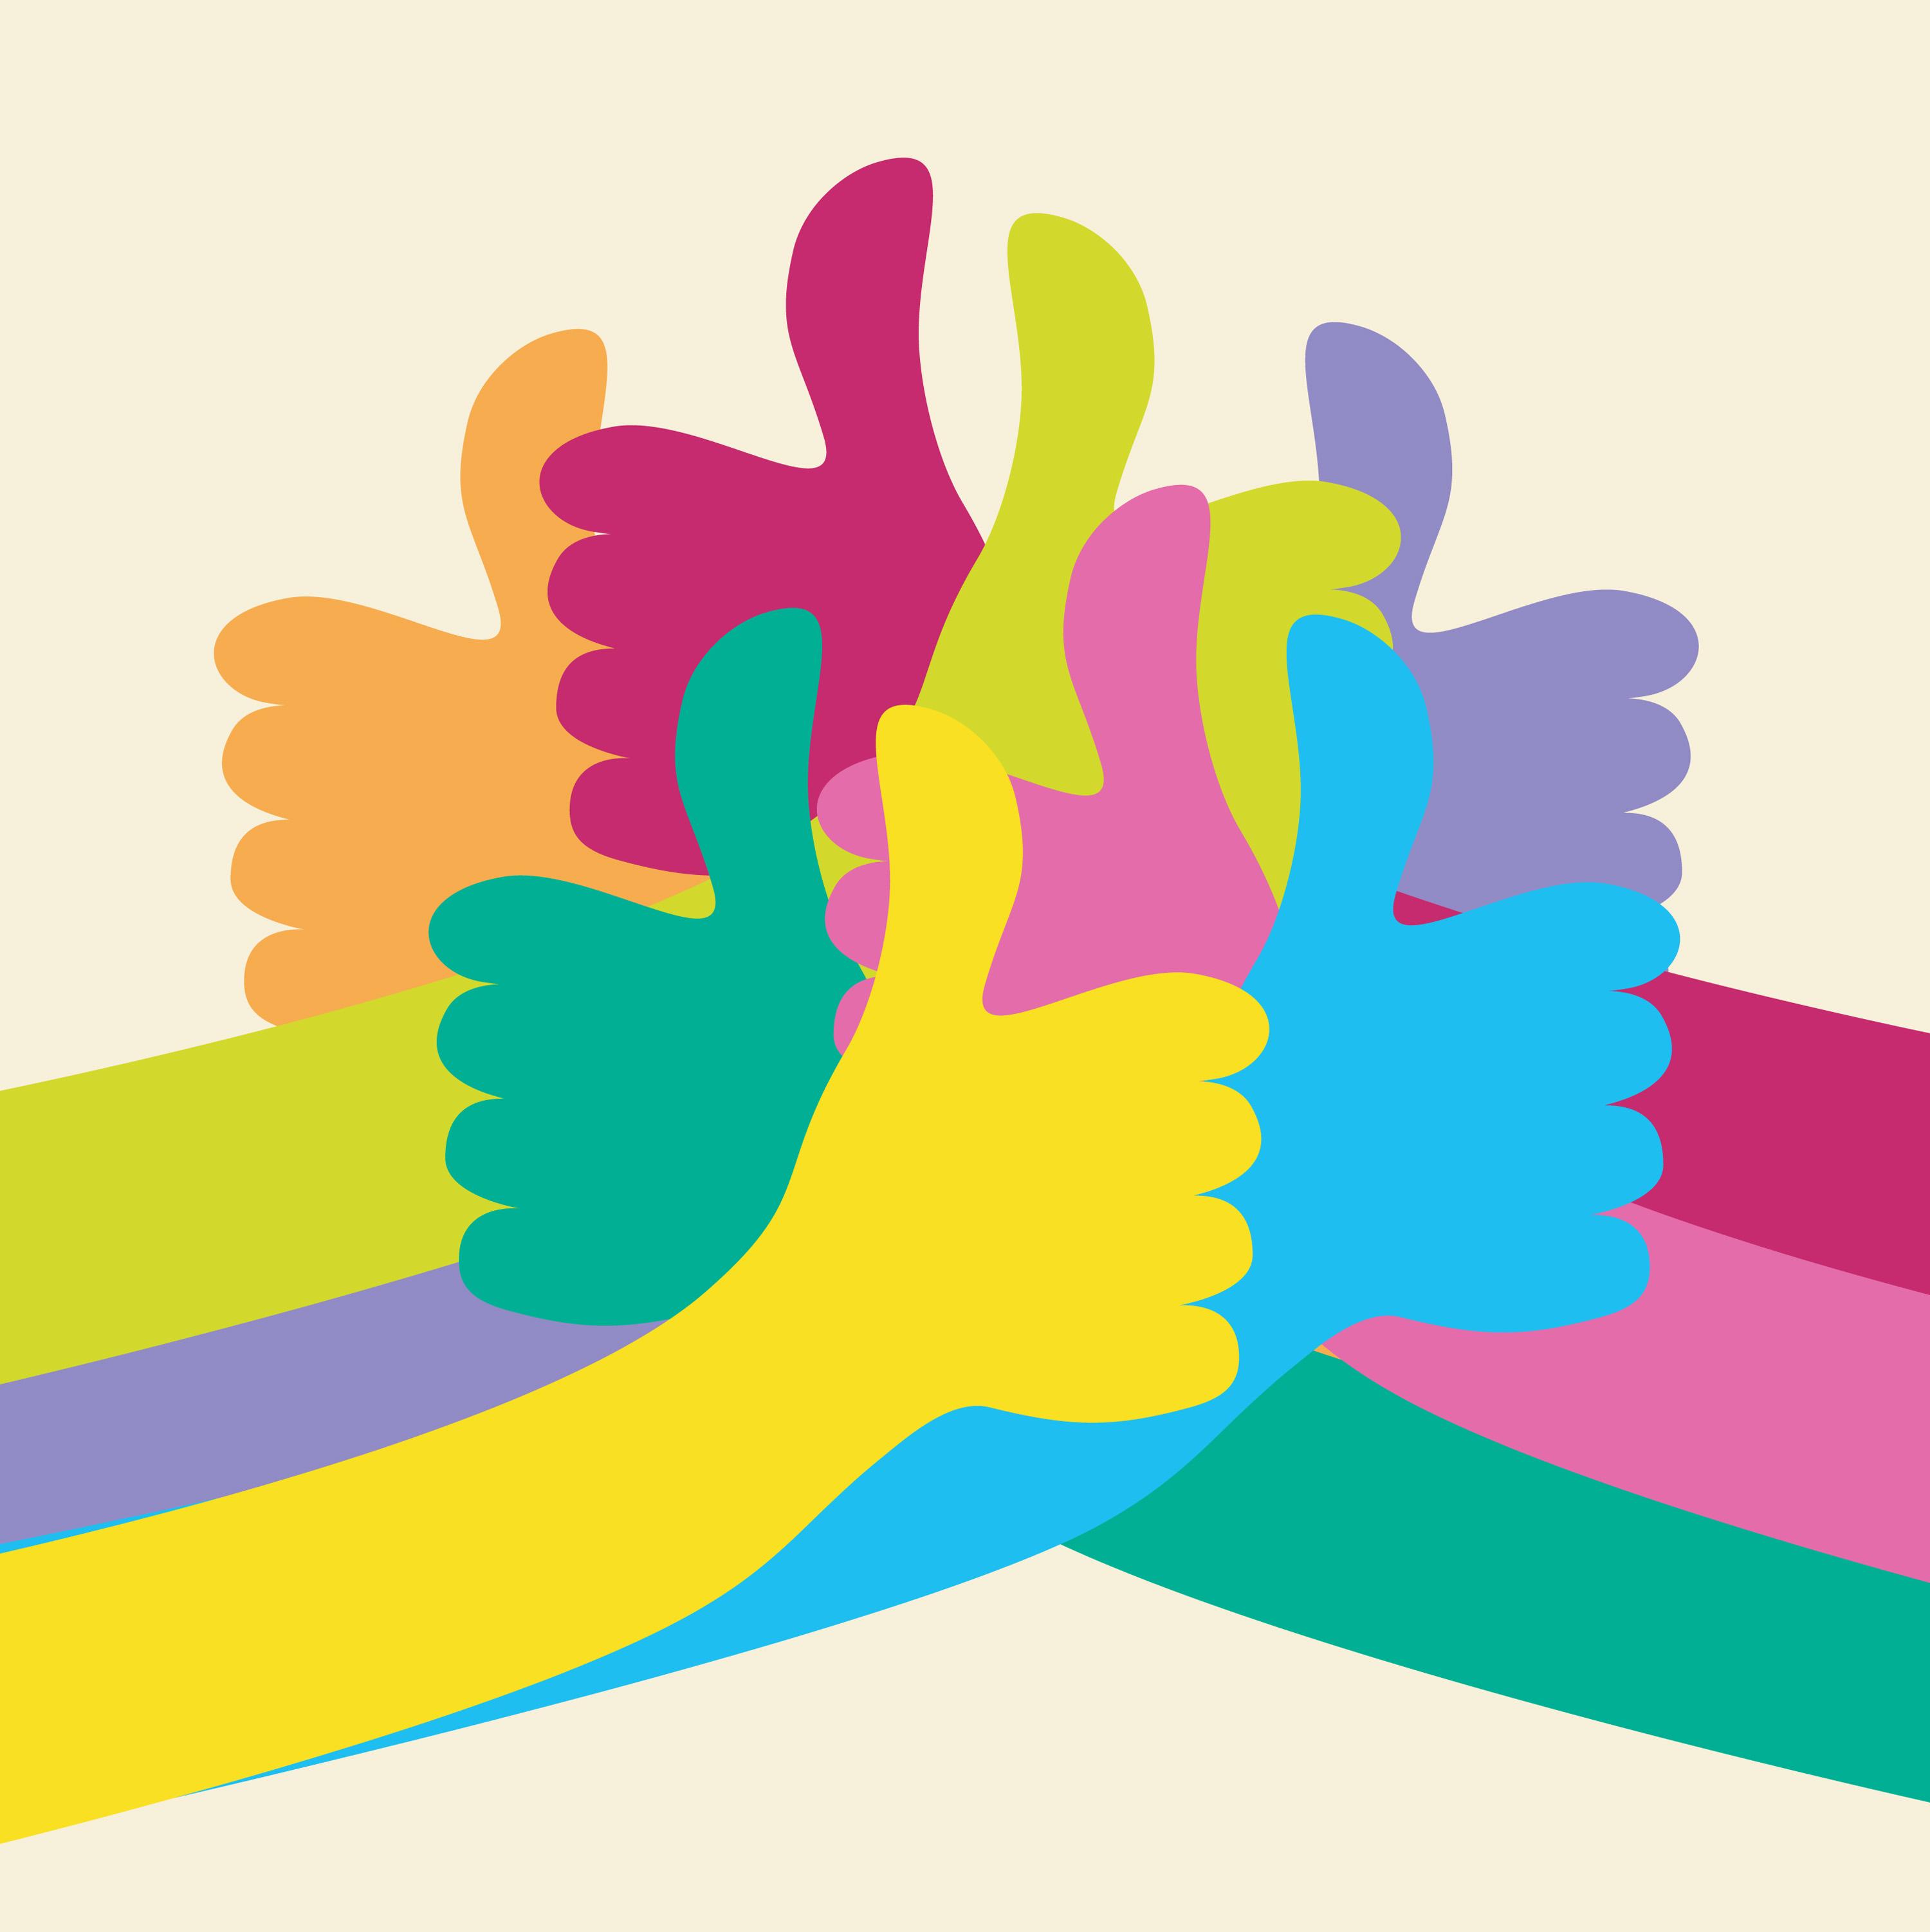 Free Employee Reward Cliparts, Download Free Clip Art, Free.